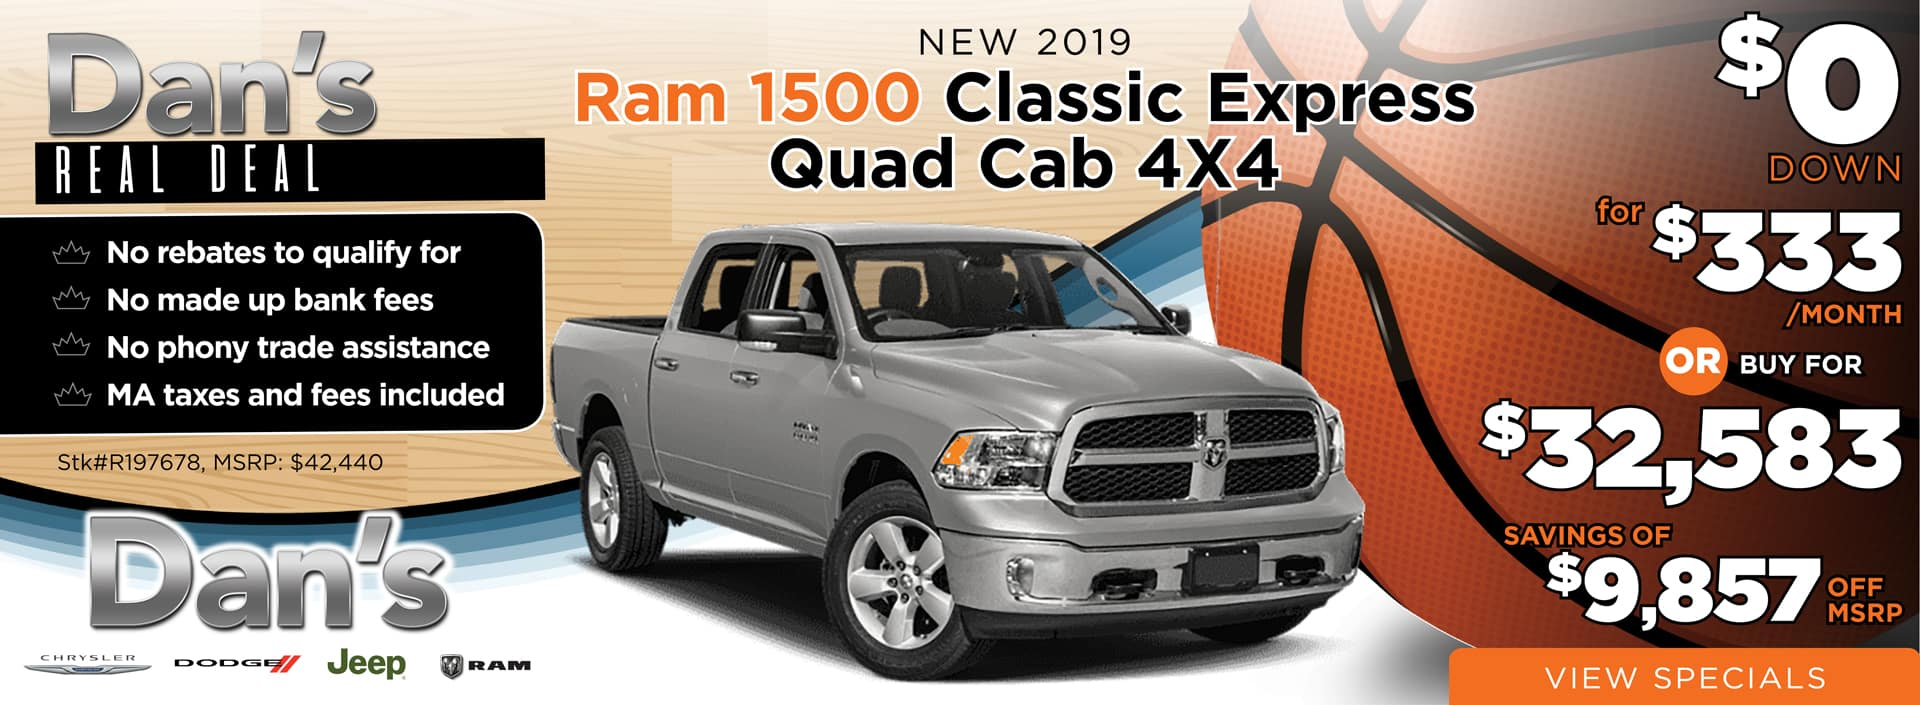 2019 Ram_1500 Classic Express